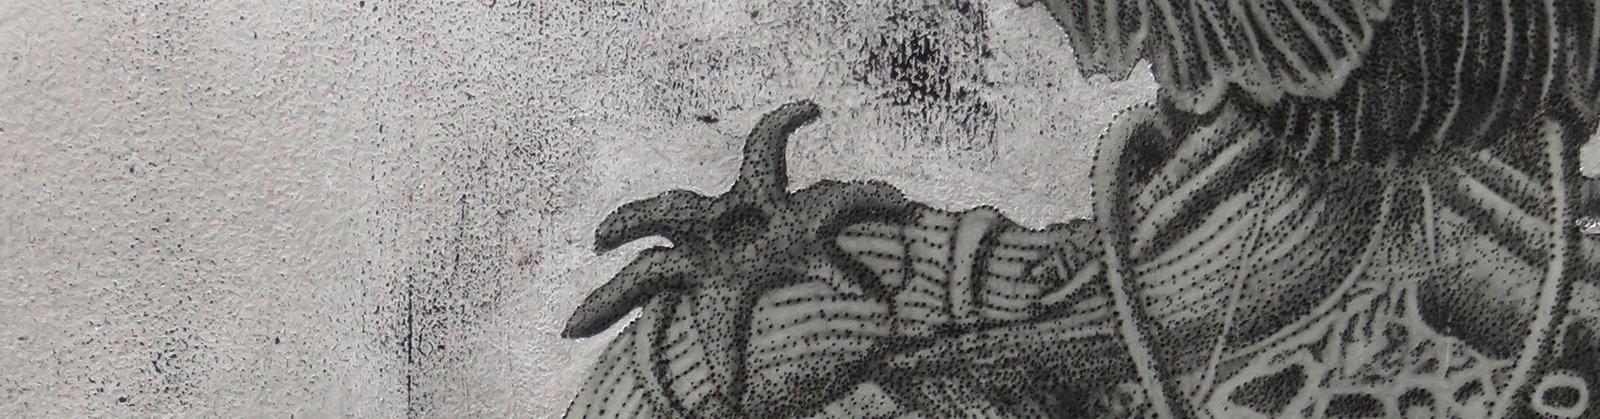 Eudes Menichetti – Indisgeste – Galerie Eko Sato – Detail Bois